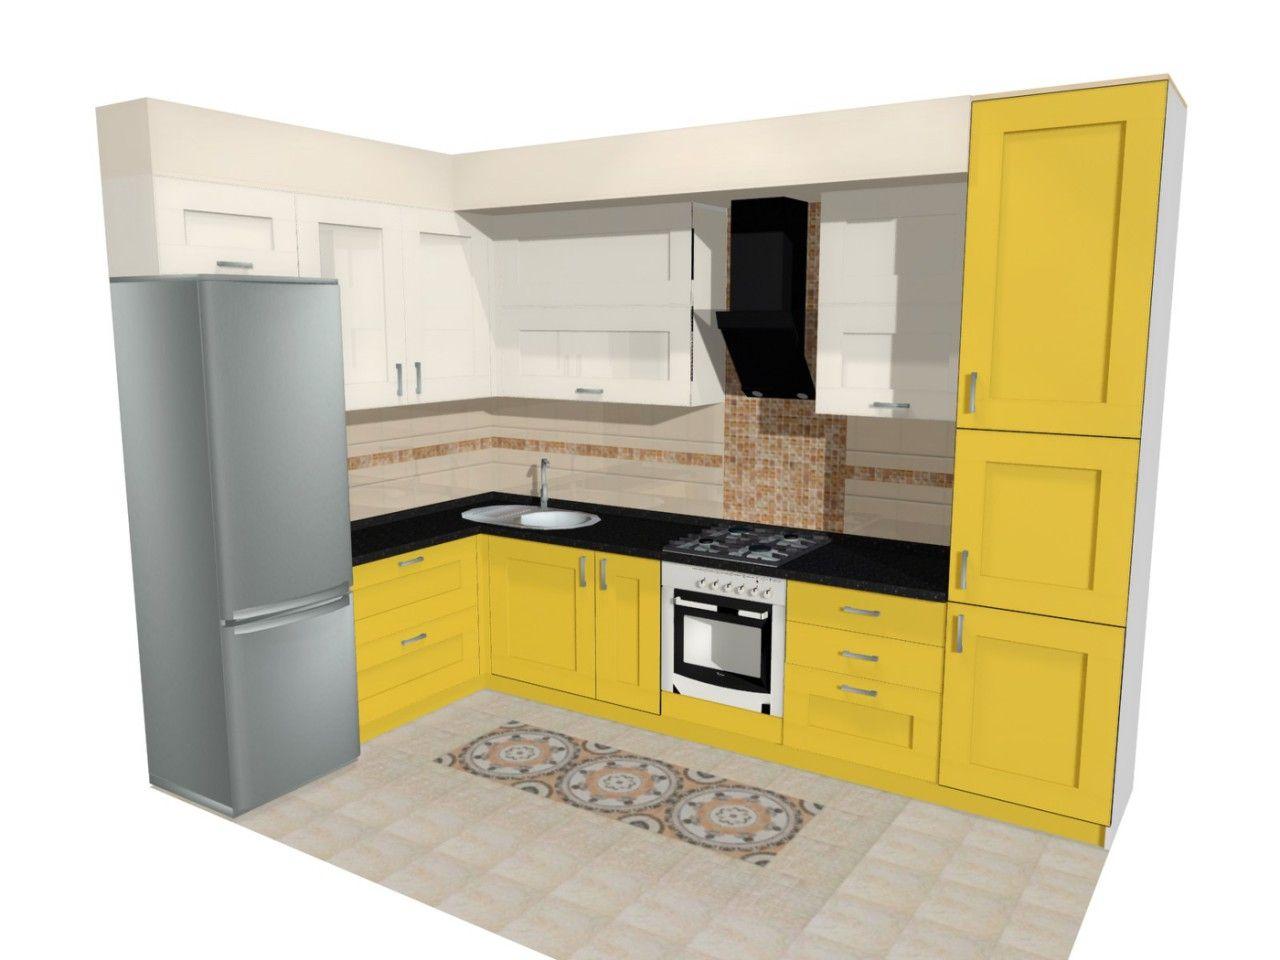 макет Pro100 макет кухни кухня желтая кухня угловая кухня со